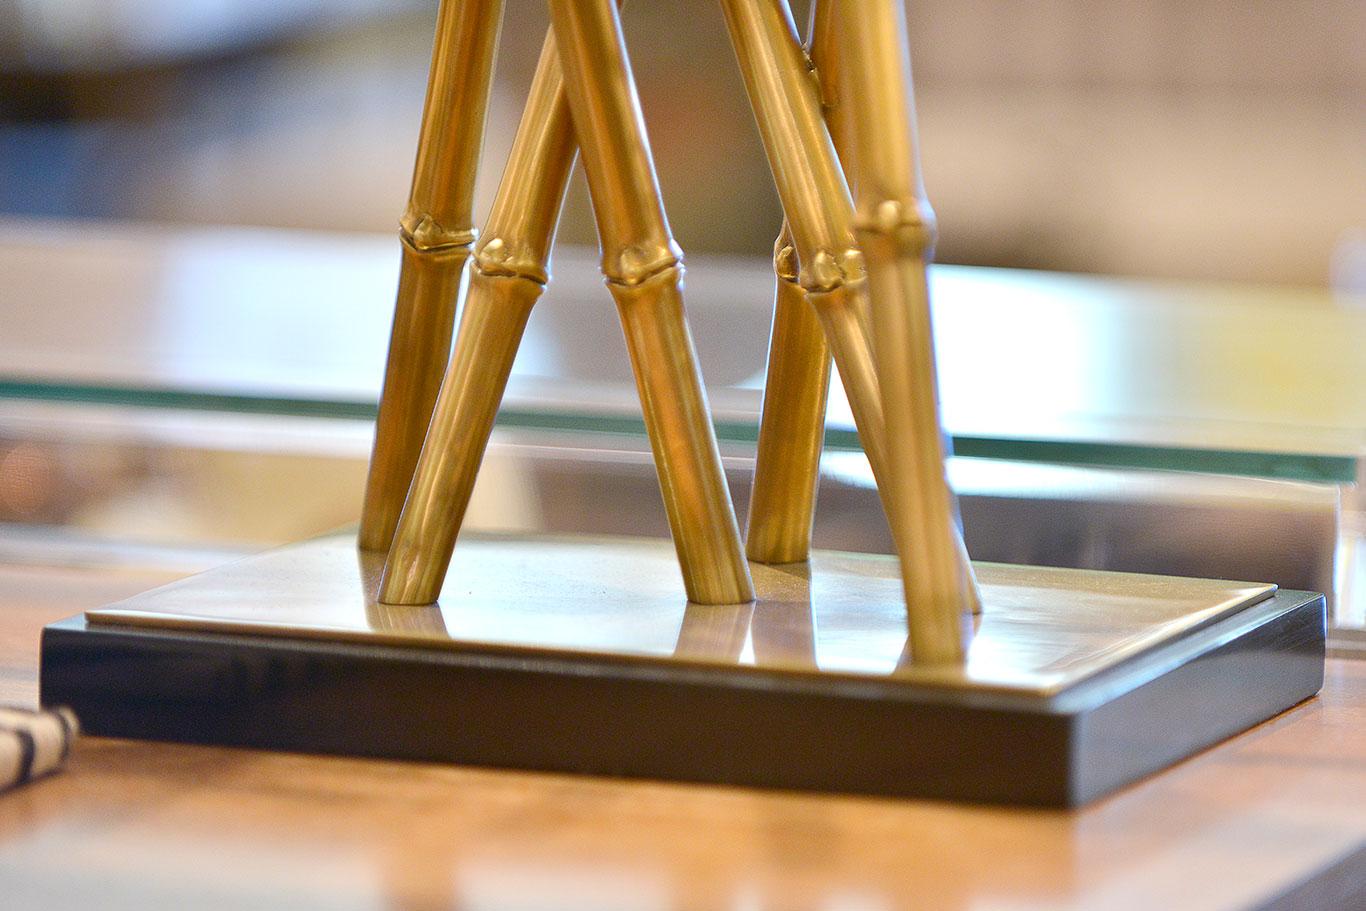 couture society lamp social bamboo faux products pagoda